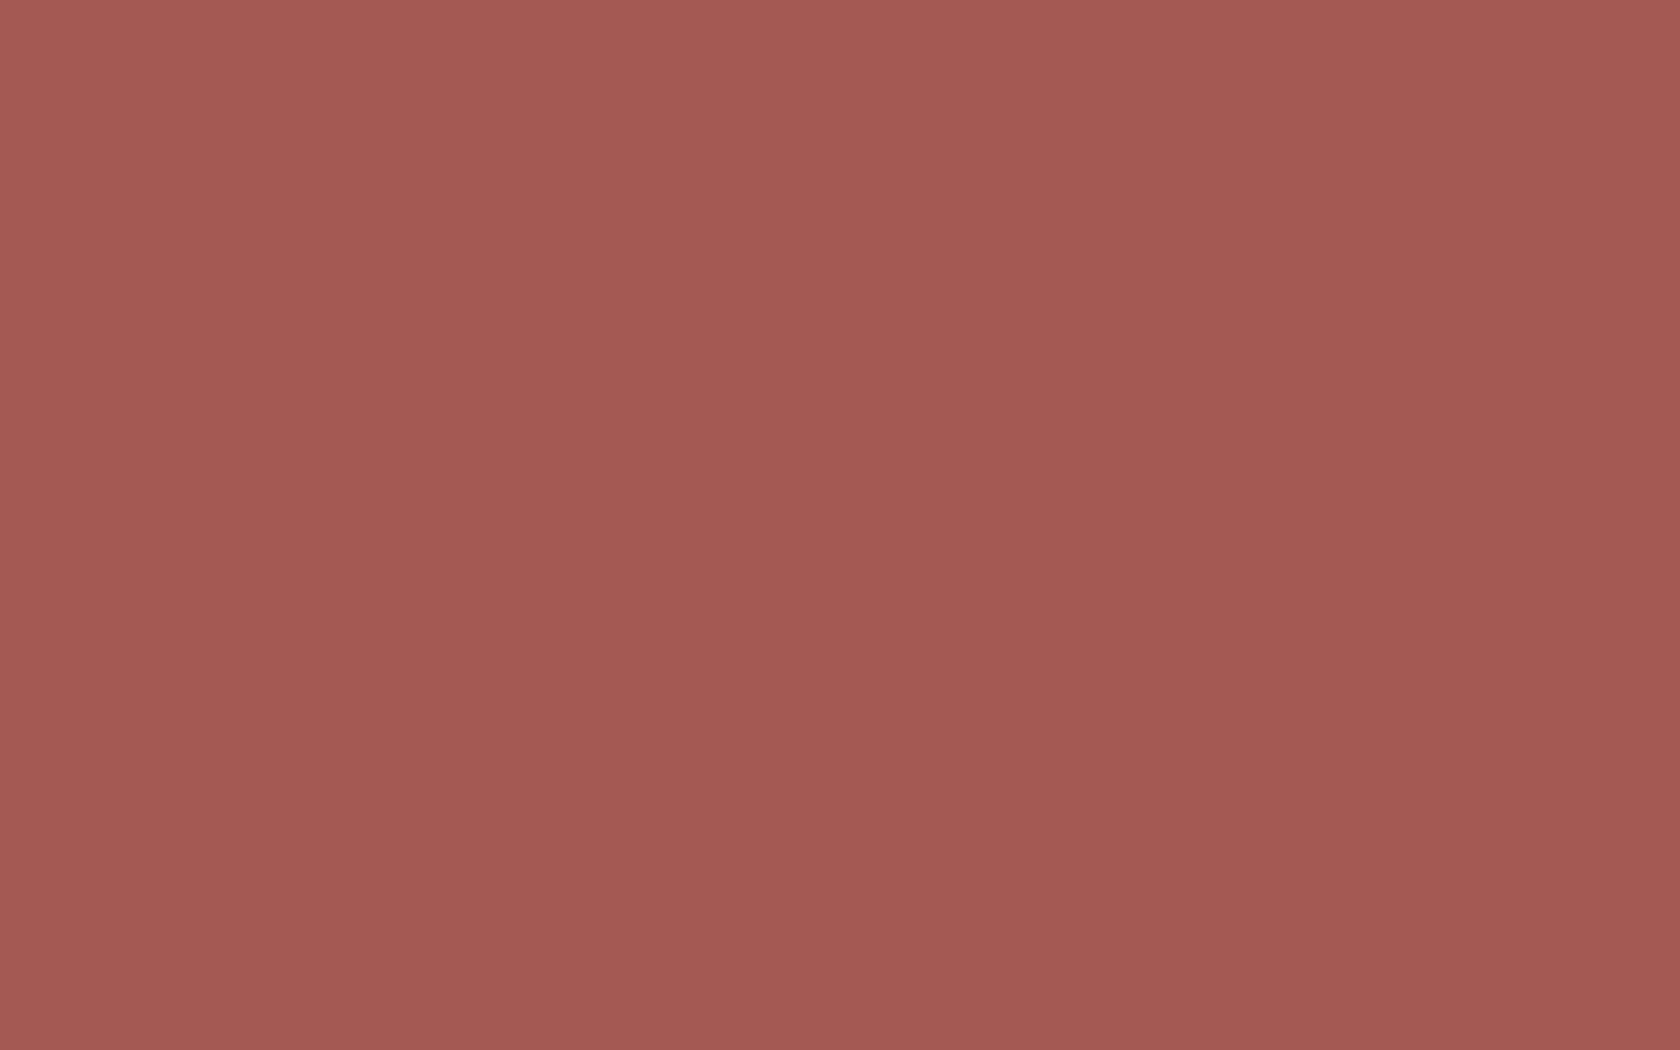 1680x1050 Redwood Solid Color Background